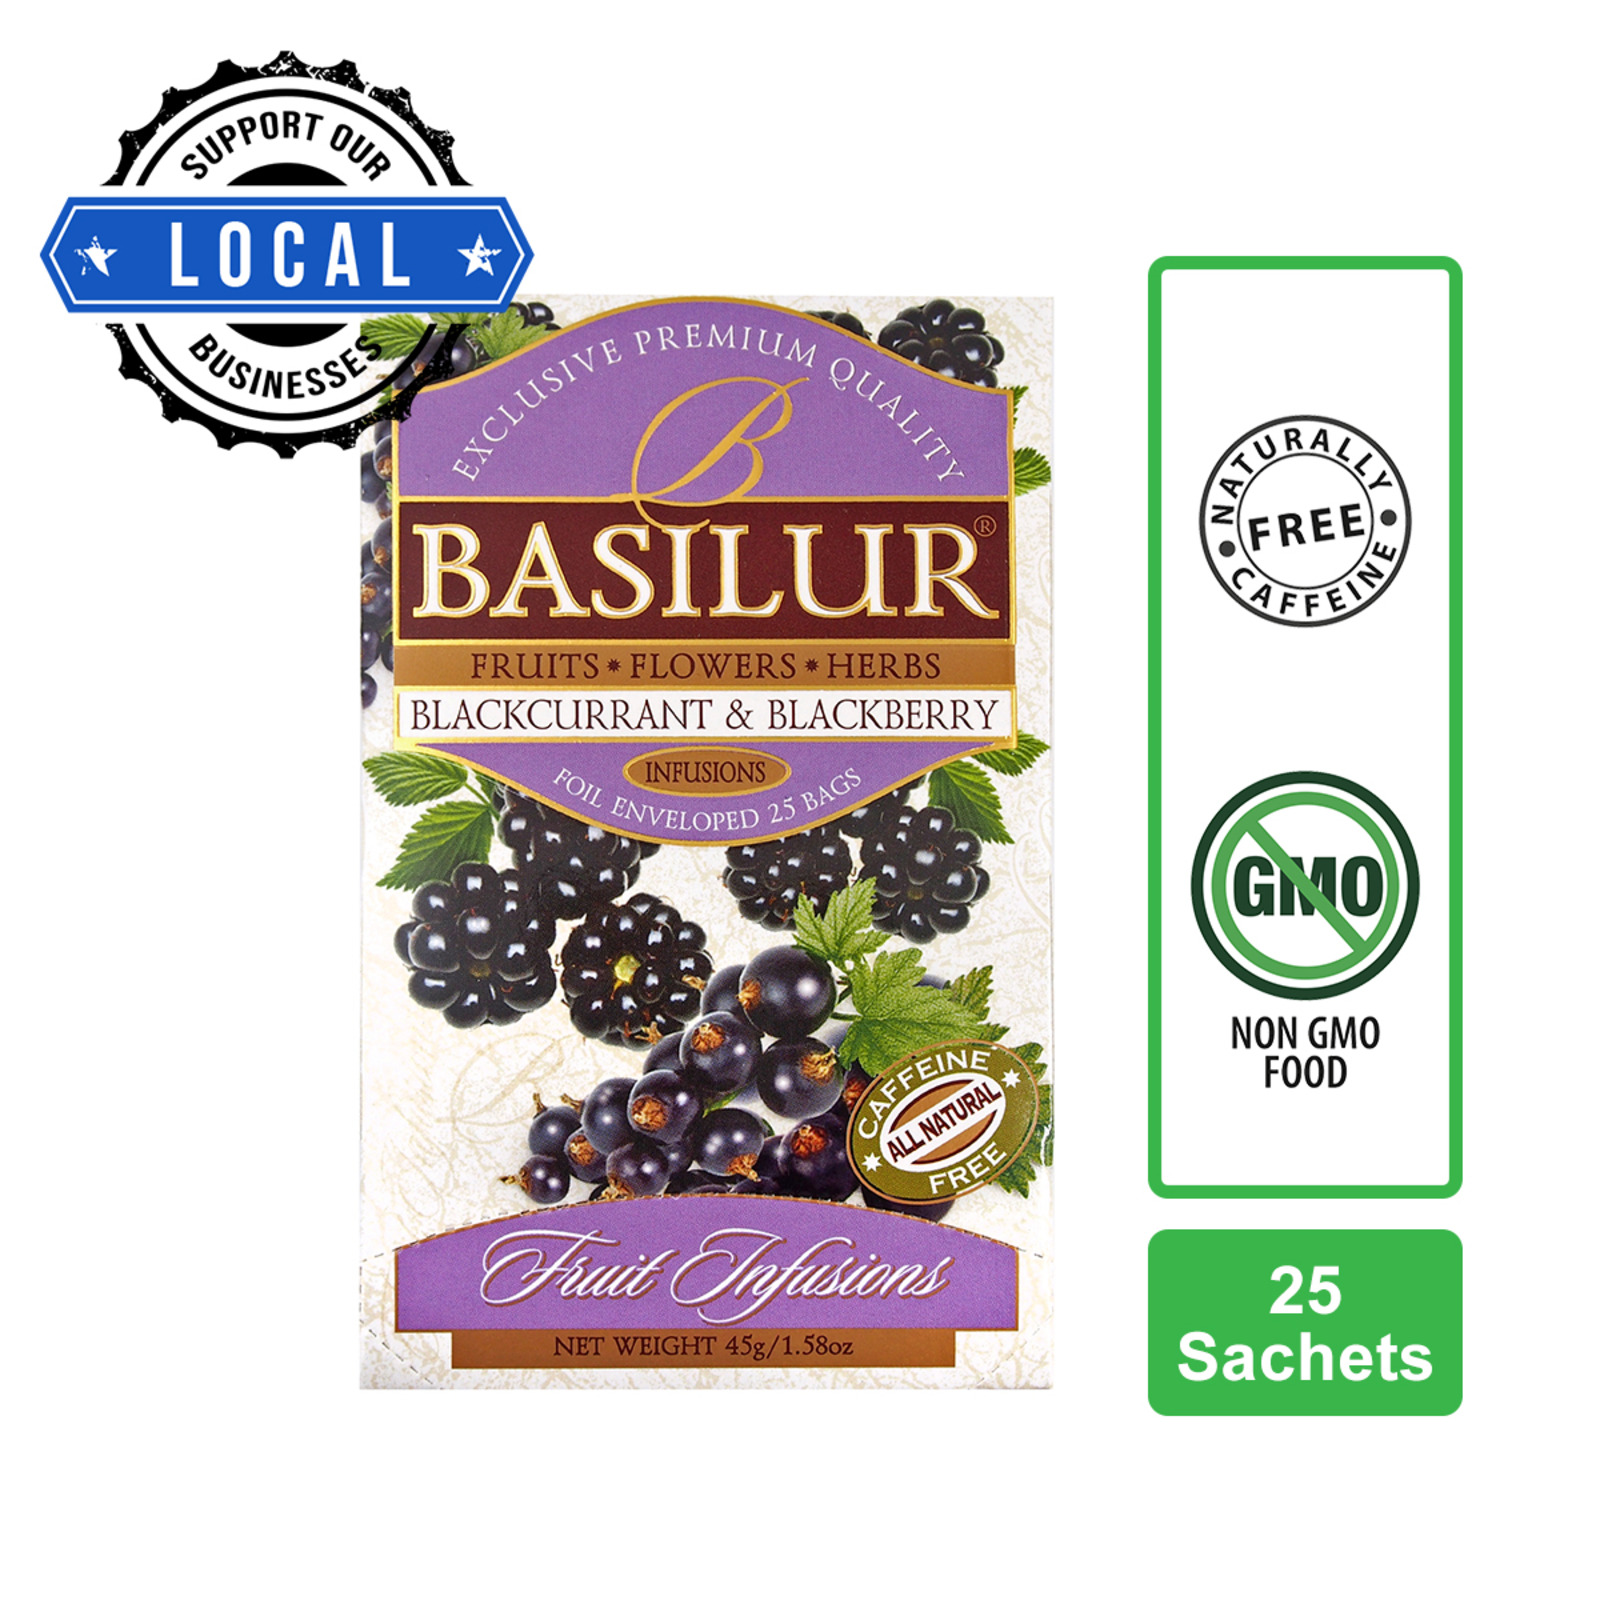 Basilur Caffeine-free Blackcurrant & Blackberry Fruit Infusions